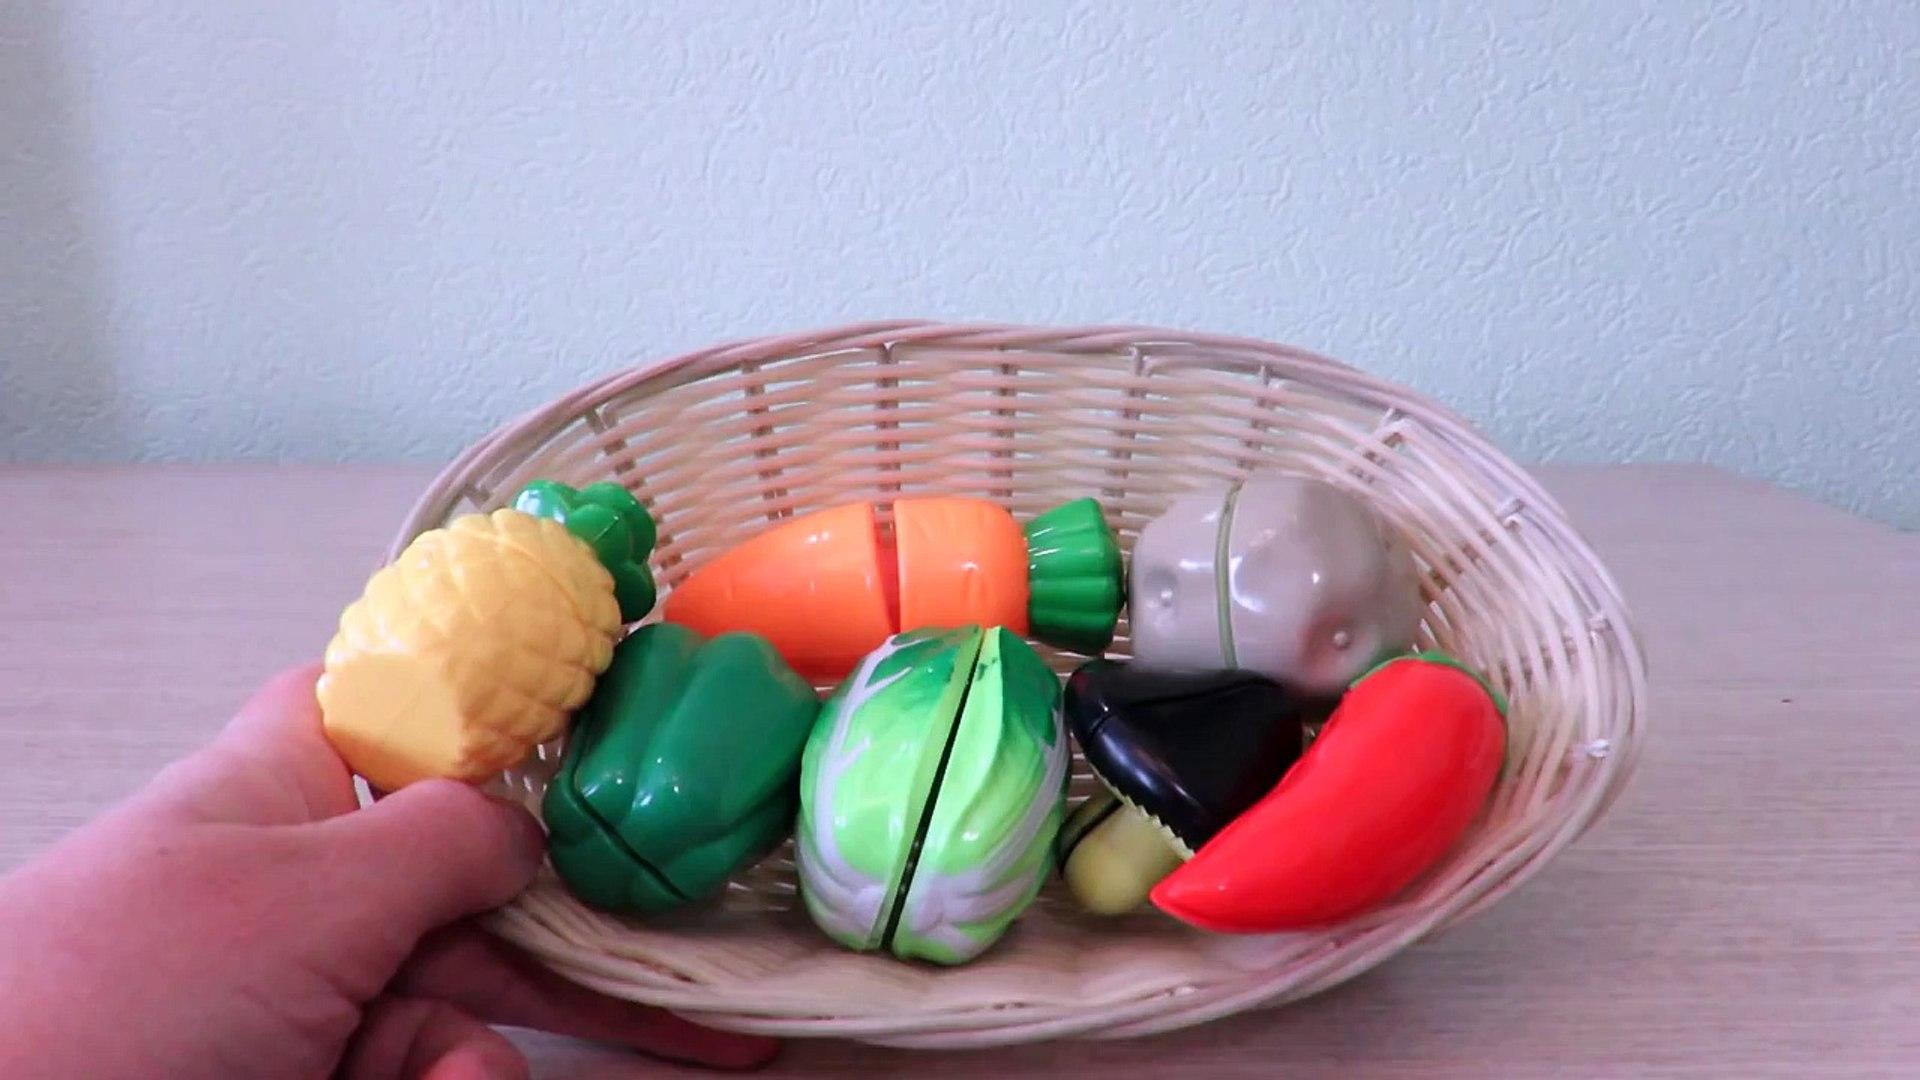 Videos for kids Vegetables cute toys for kids учимся готовить childrens toy игрушечные овощи